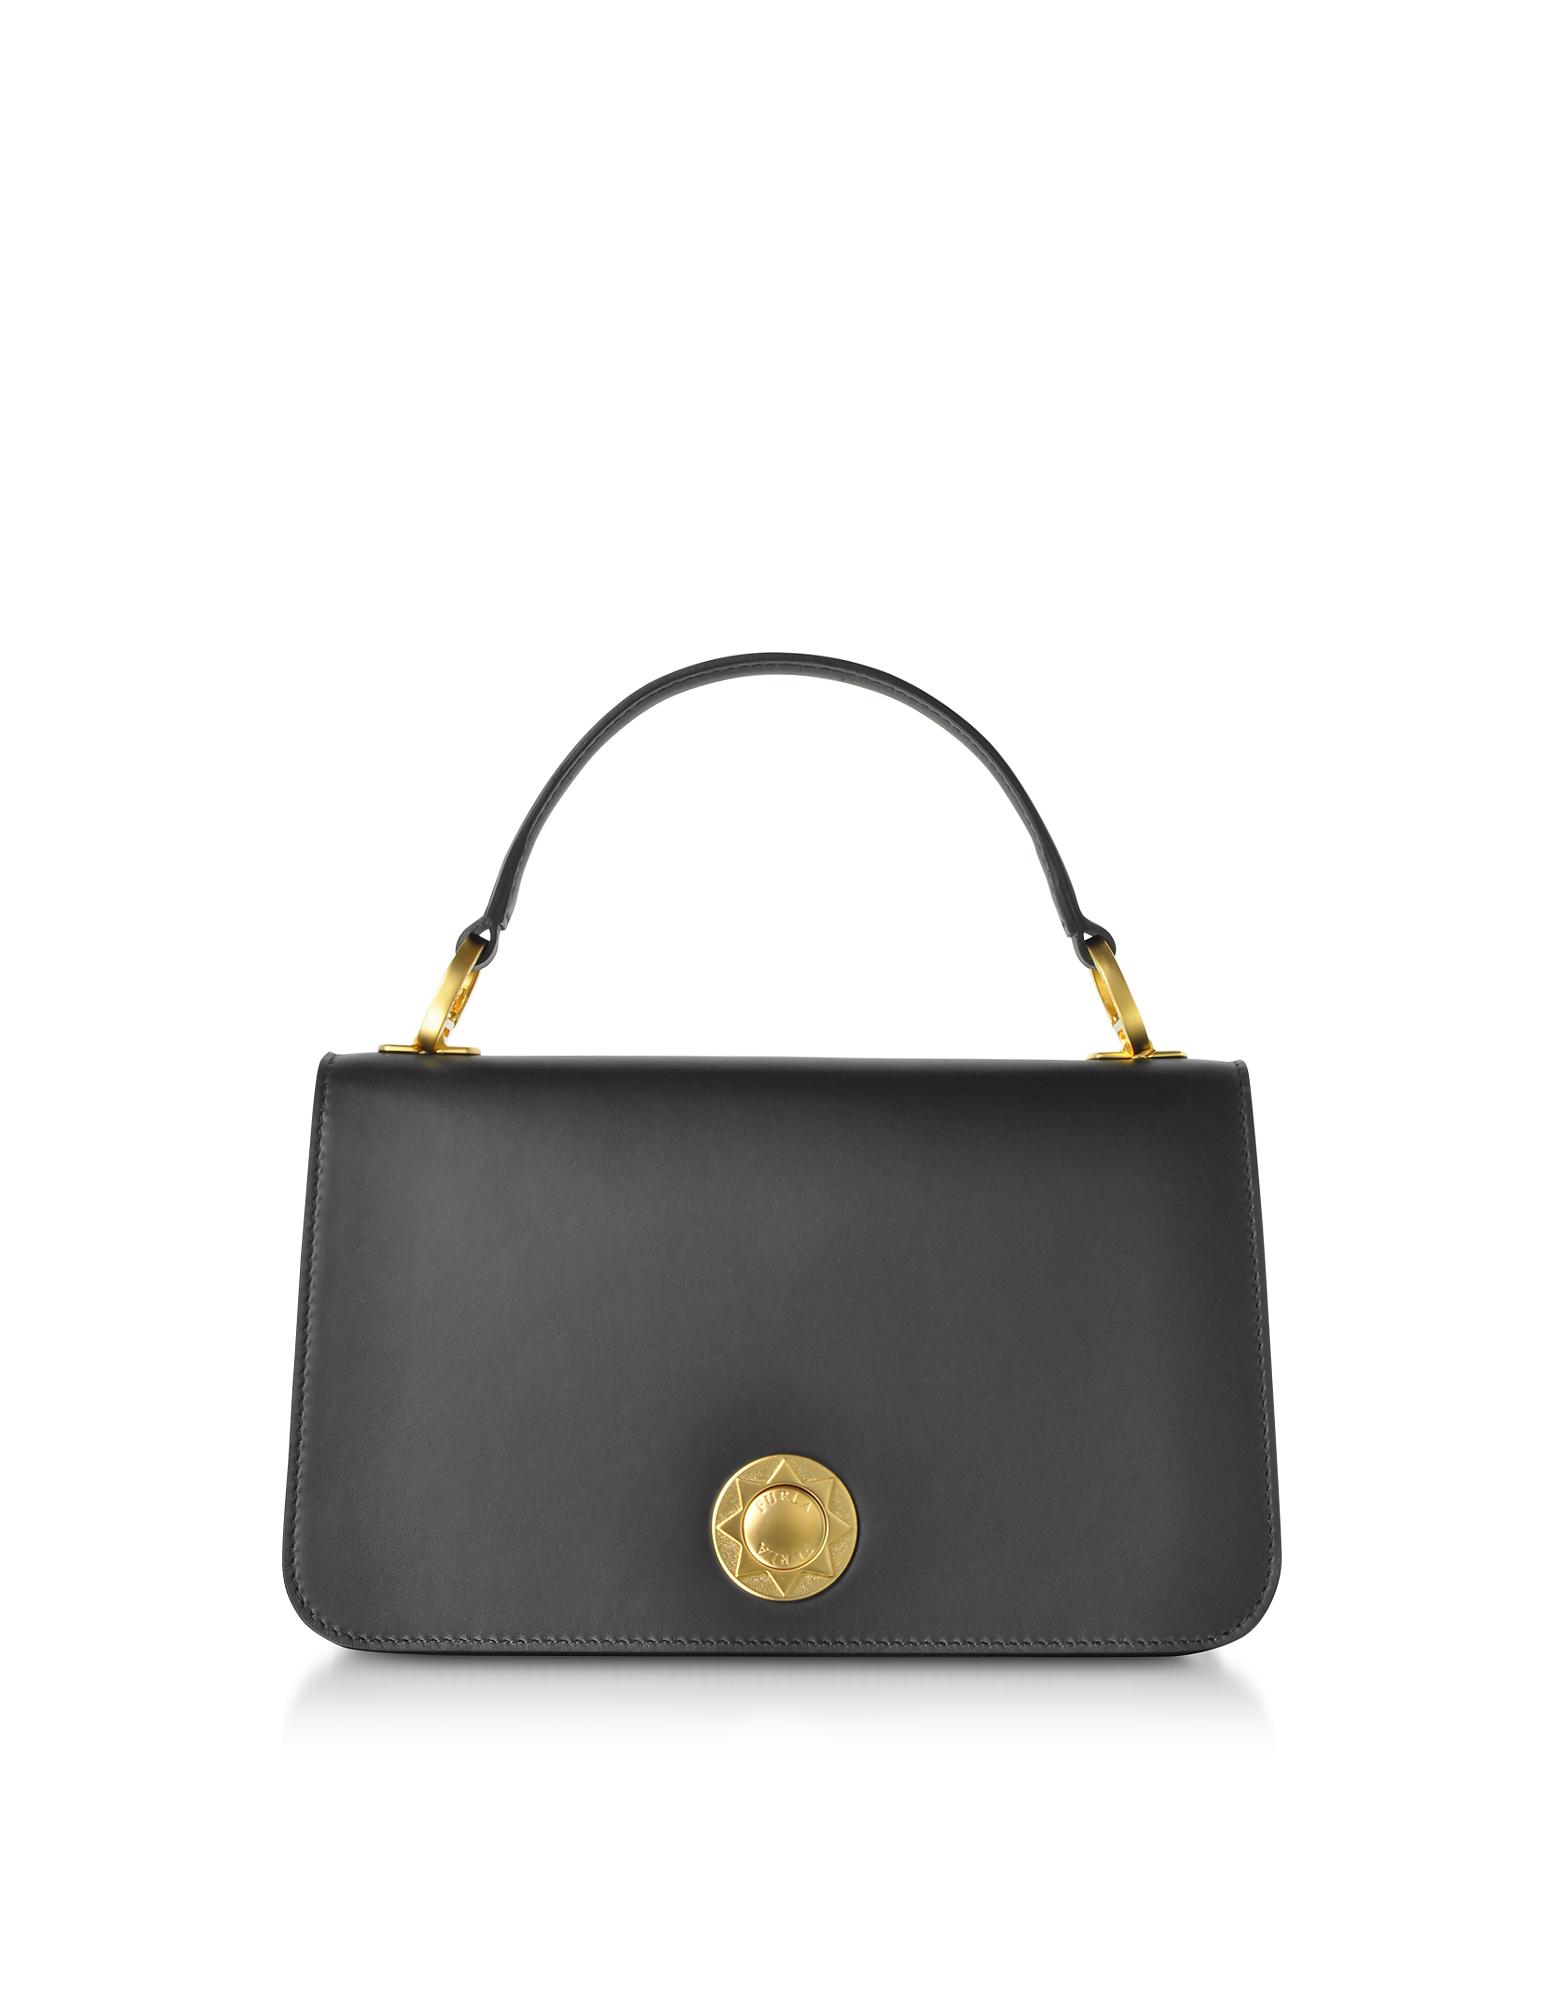 536946ecbb Furla Luna Small Top Handle Bag In Black Onyx | ModeSens